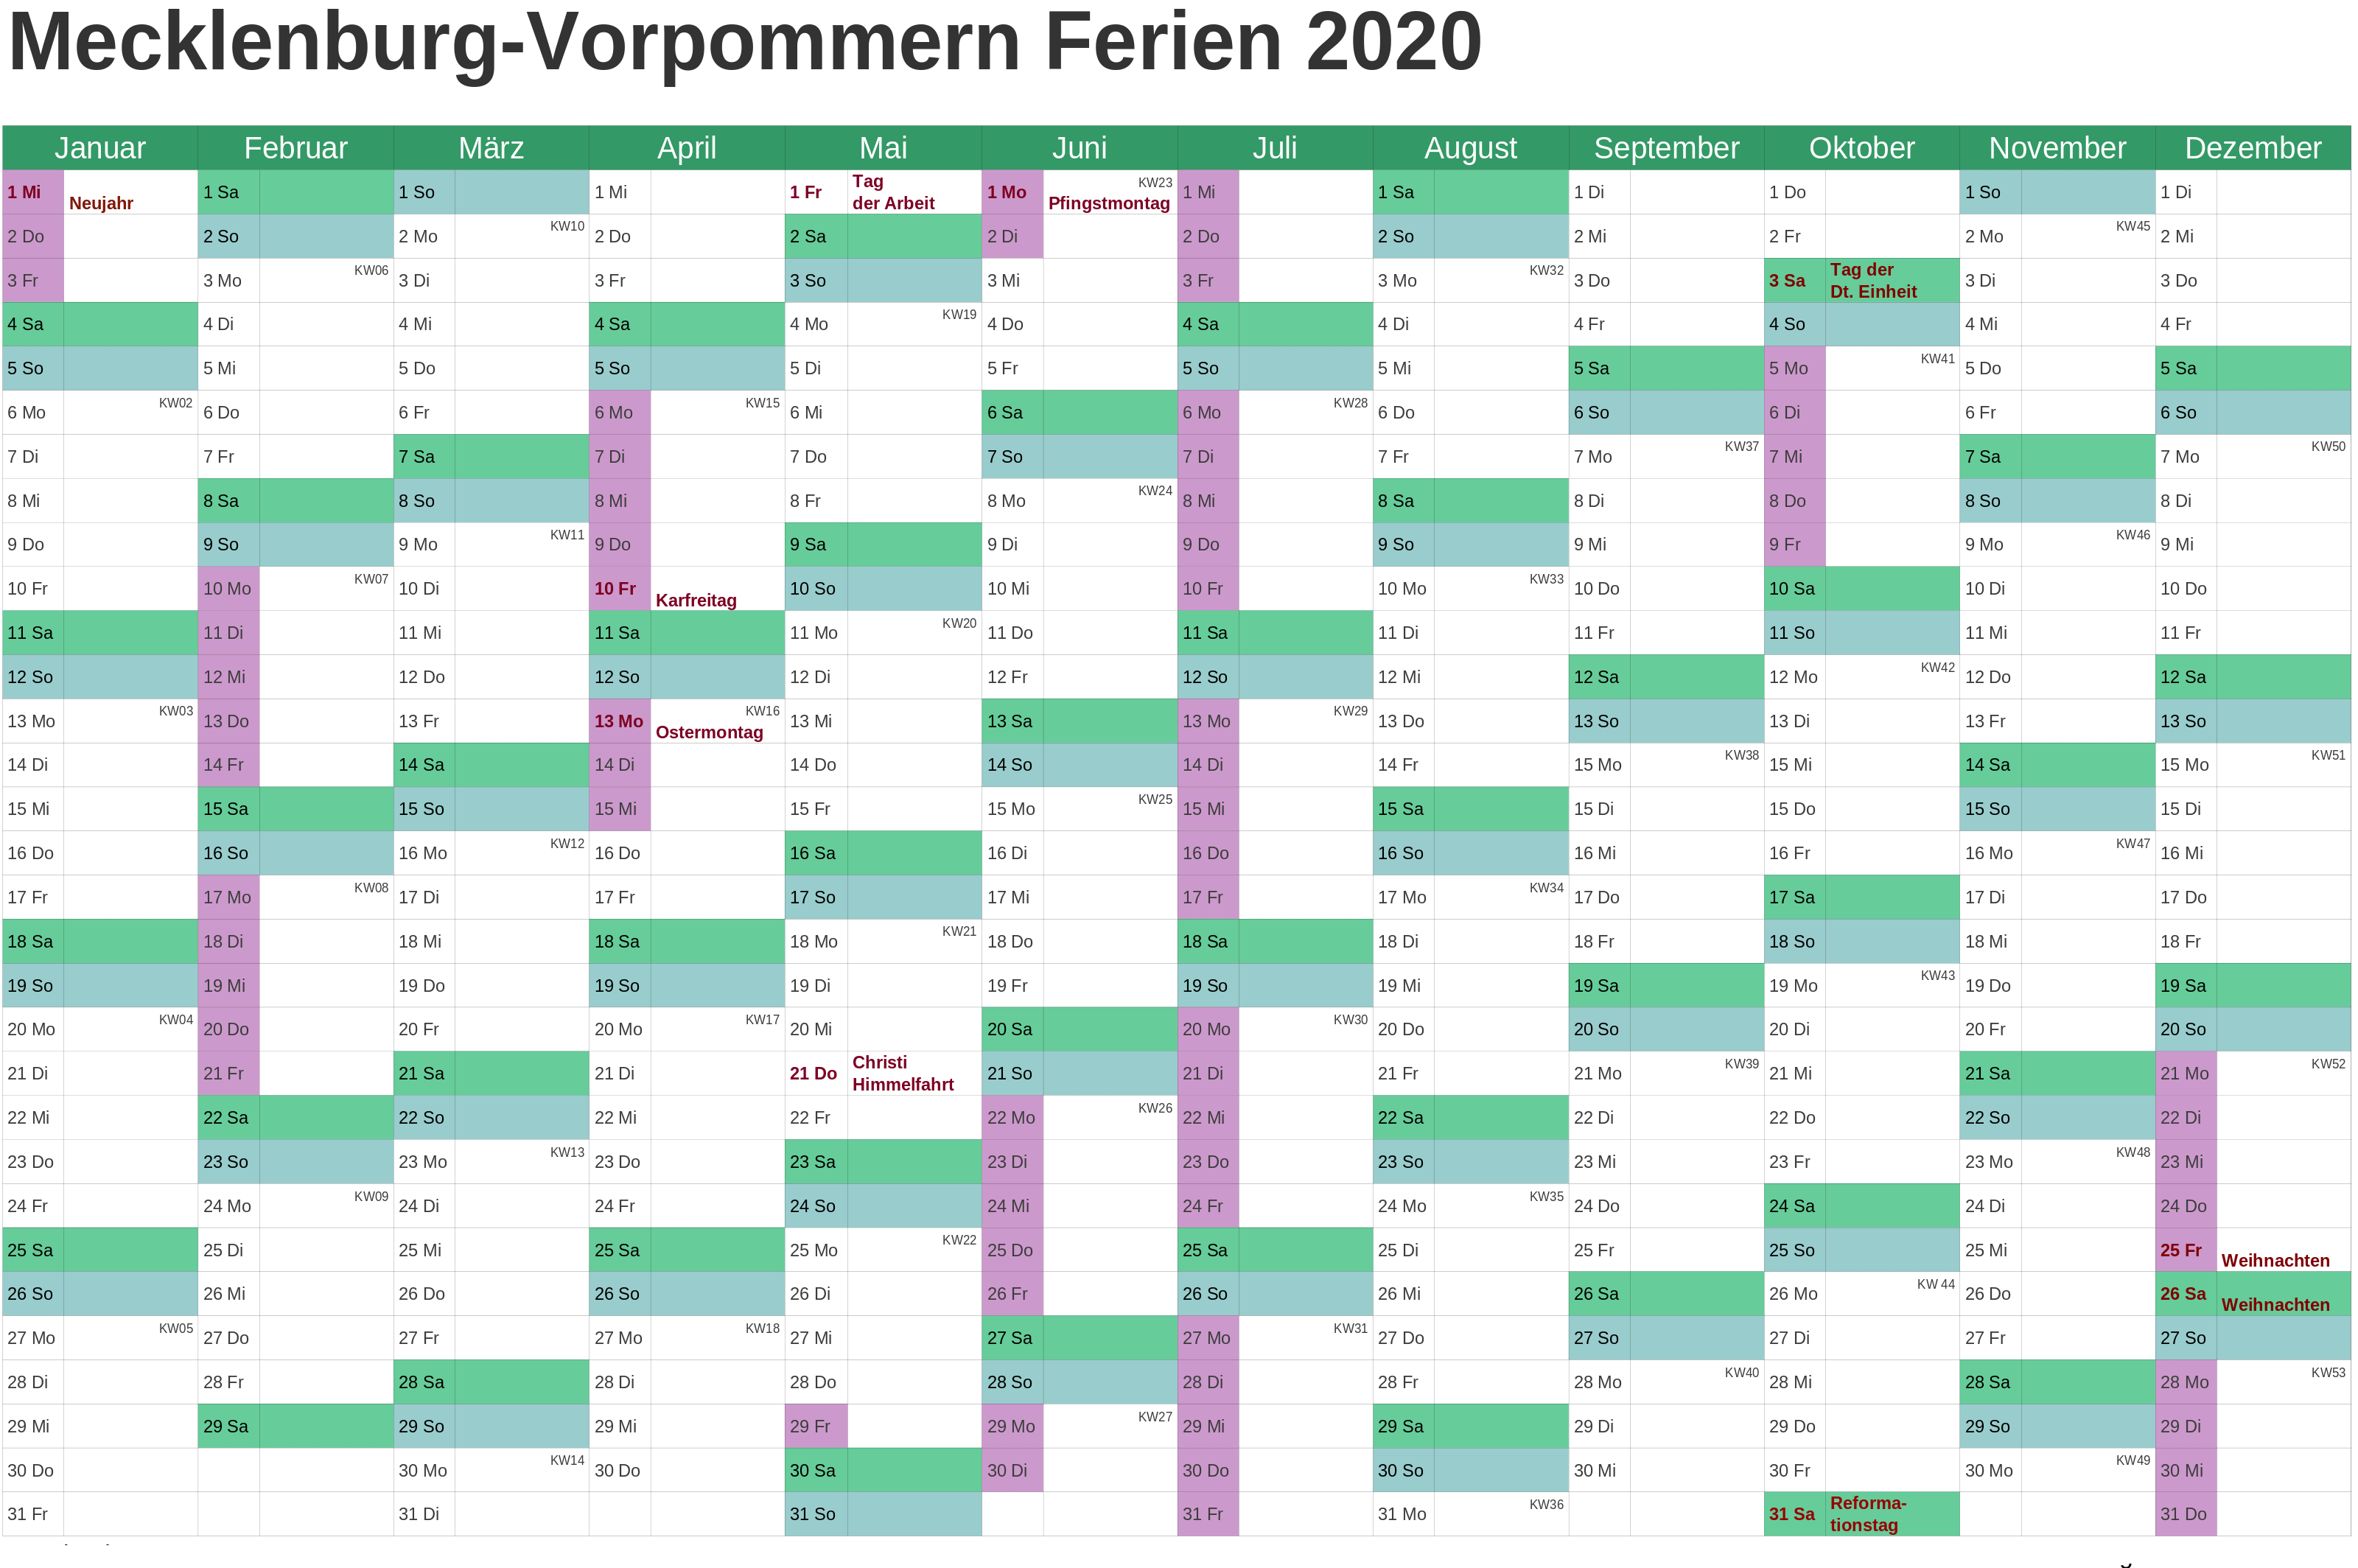 Sommerferien 2020 Mecklenburg-Vorpommern Kalender PDF